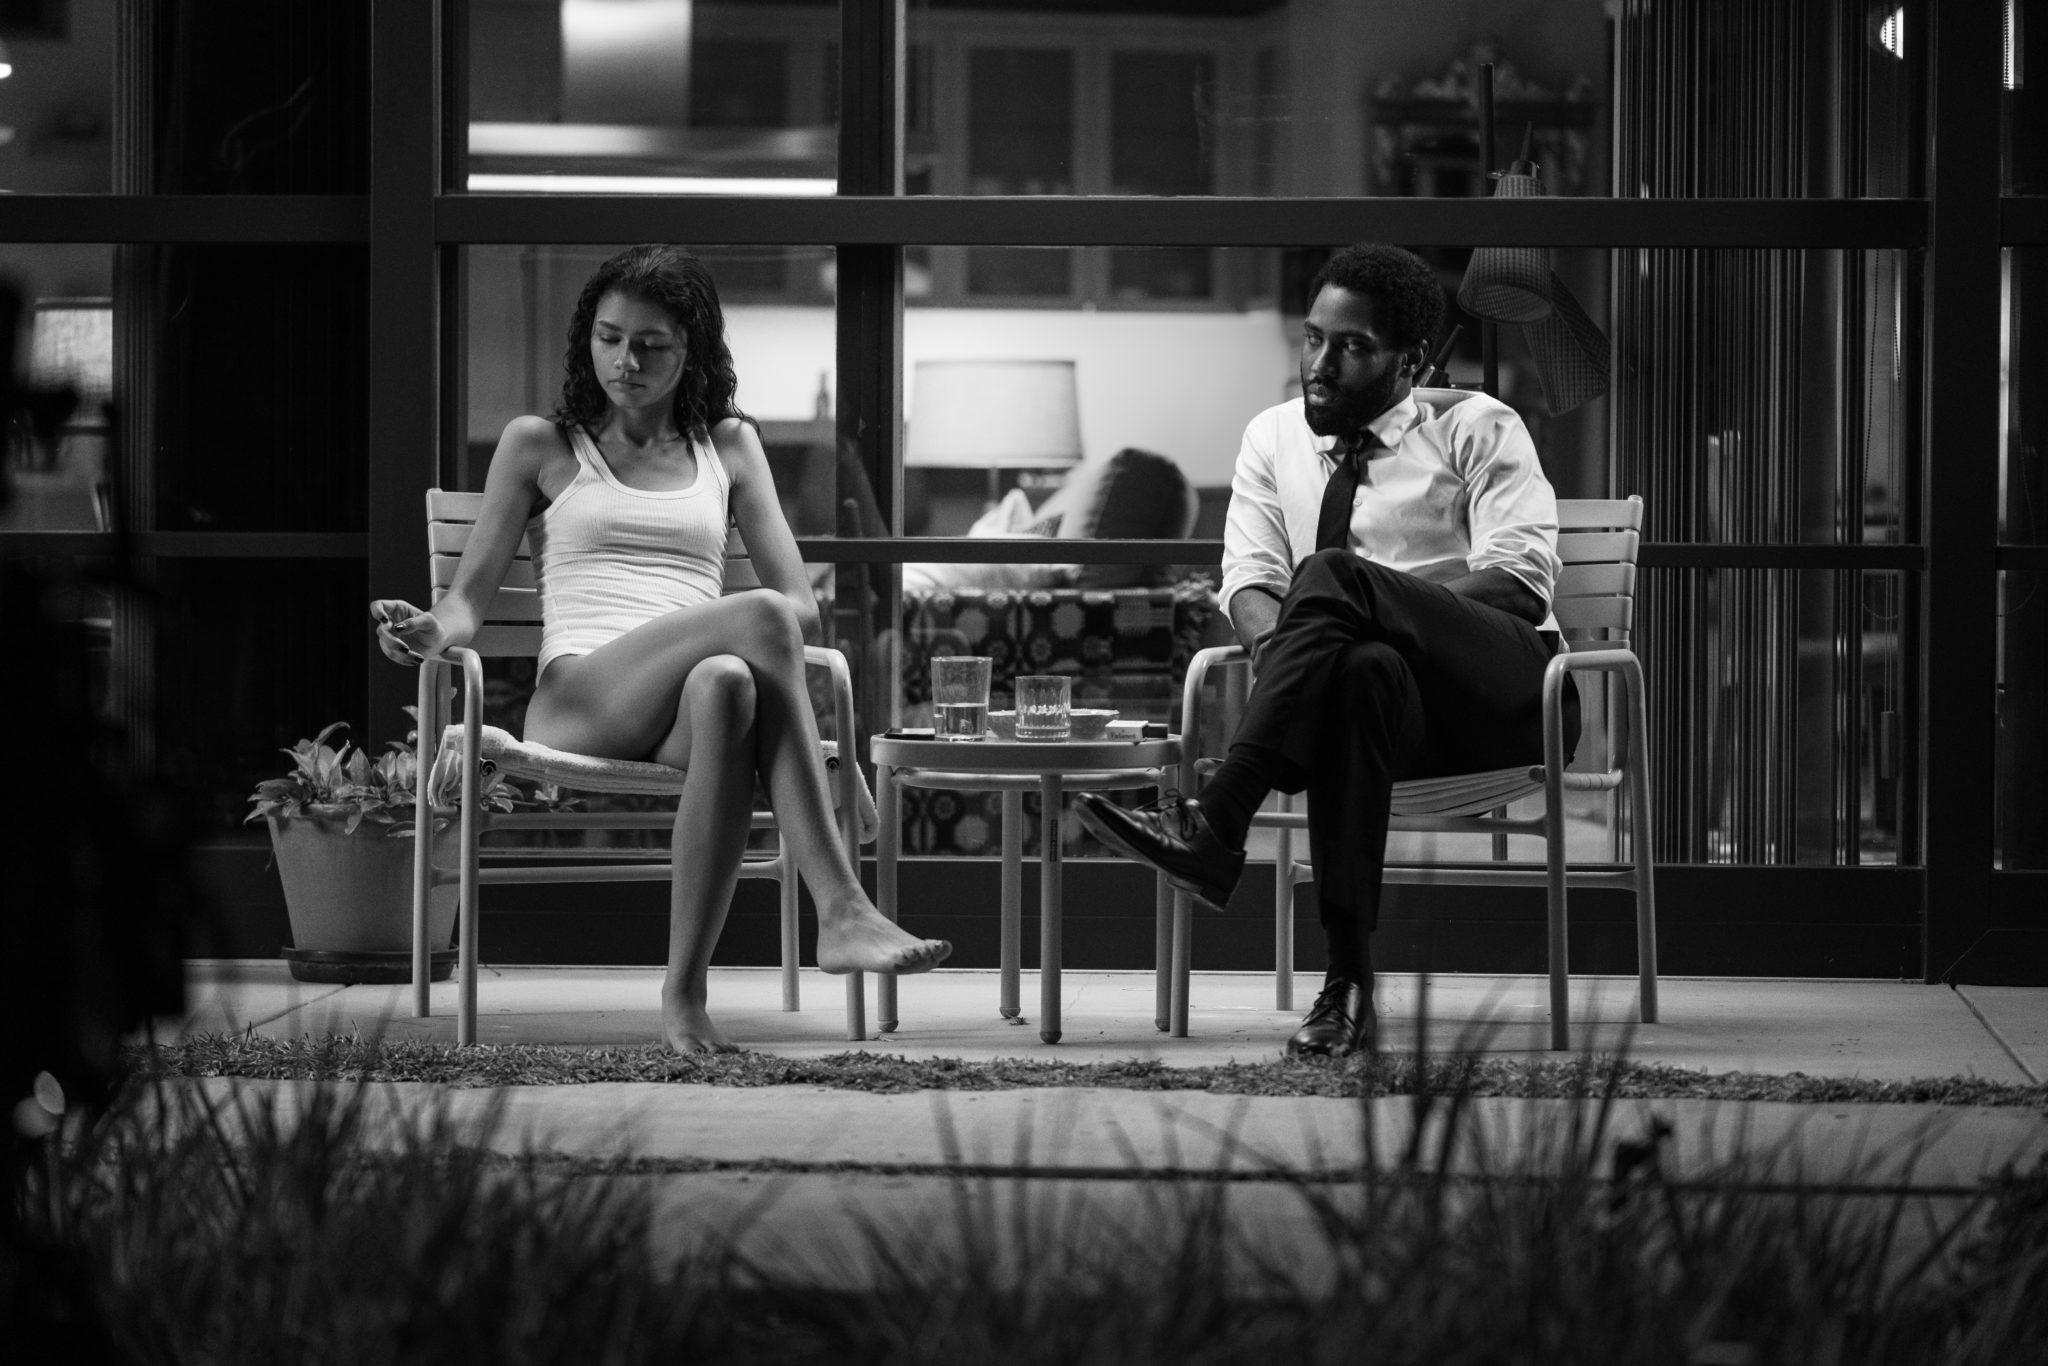 Watch the trailer for Zendaya's achingly romantic new drama